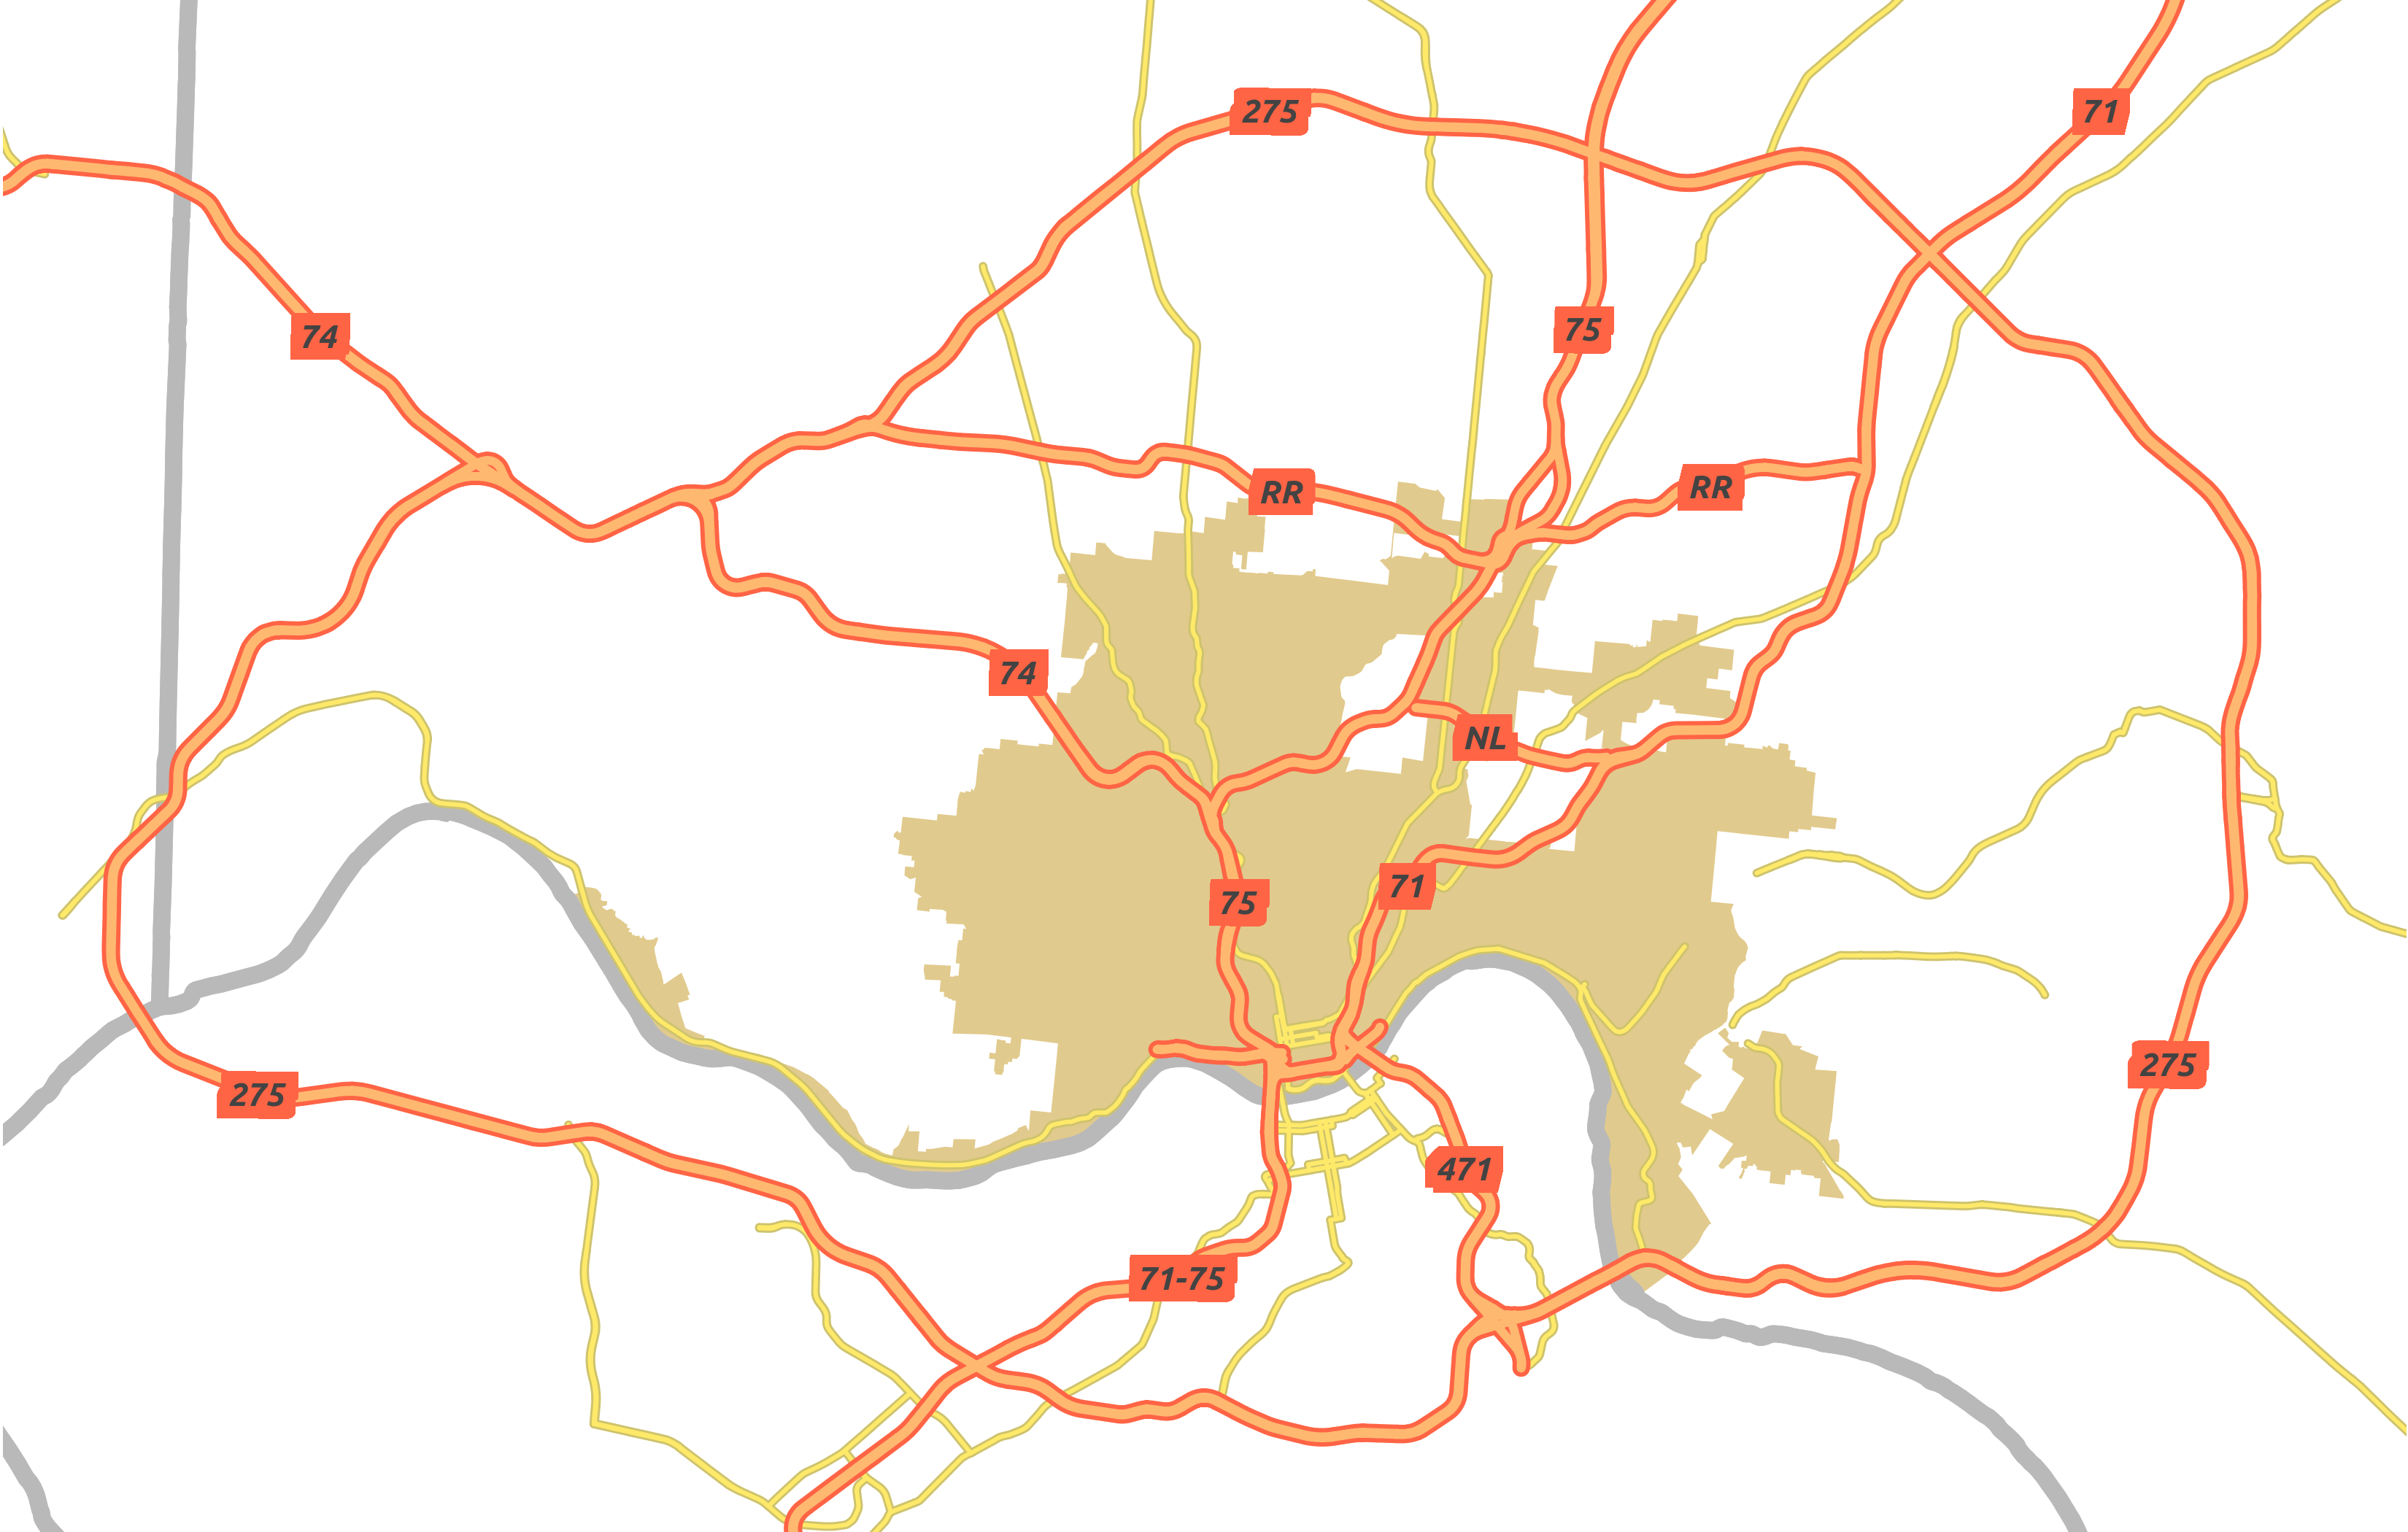 FileHighways of Greater Cincinnatipng Wikimedia Commons